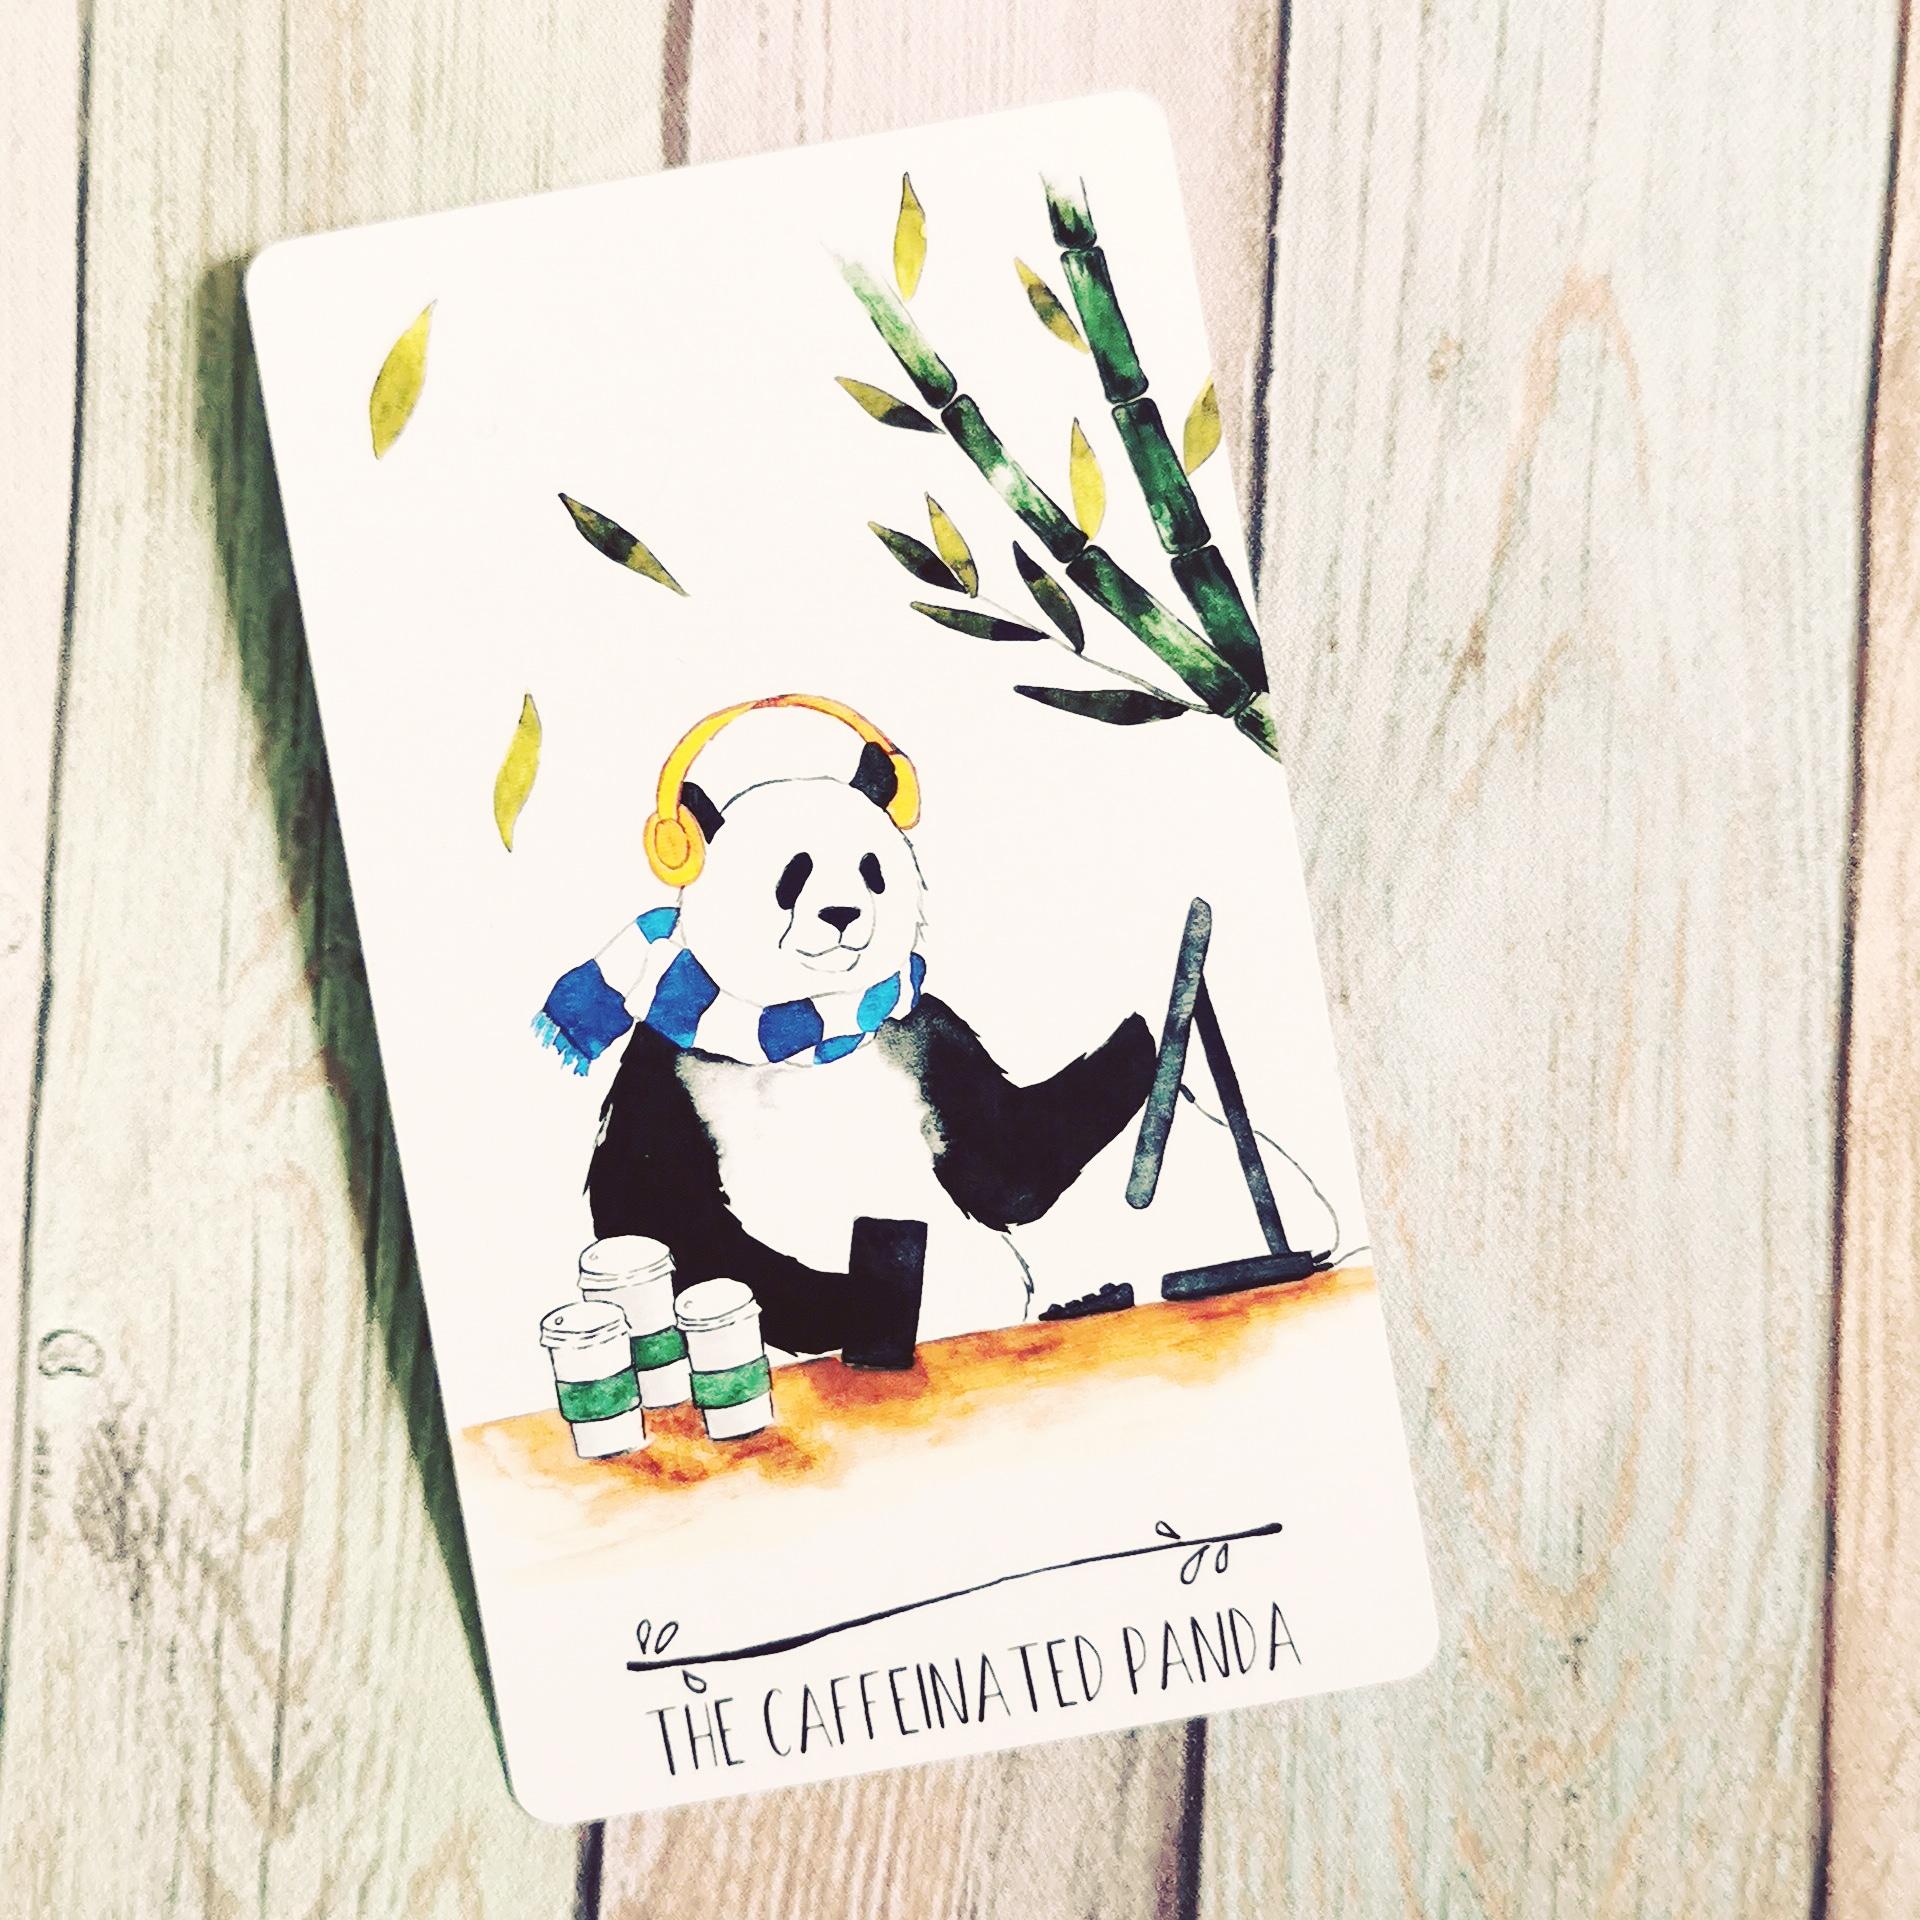 THE CAFFEINATED PANDA:  TEA, COFFEE, TECHNOLOGY & GADGETS